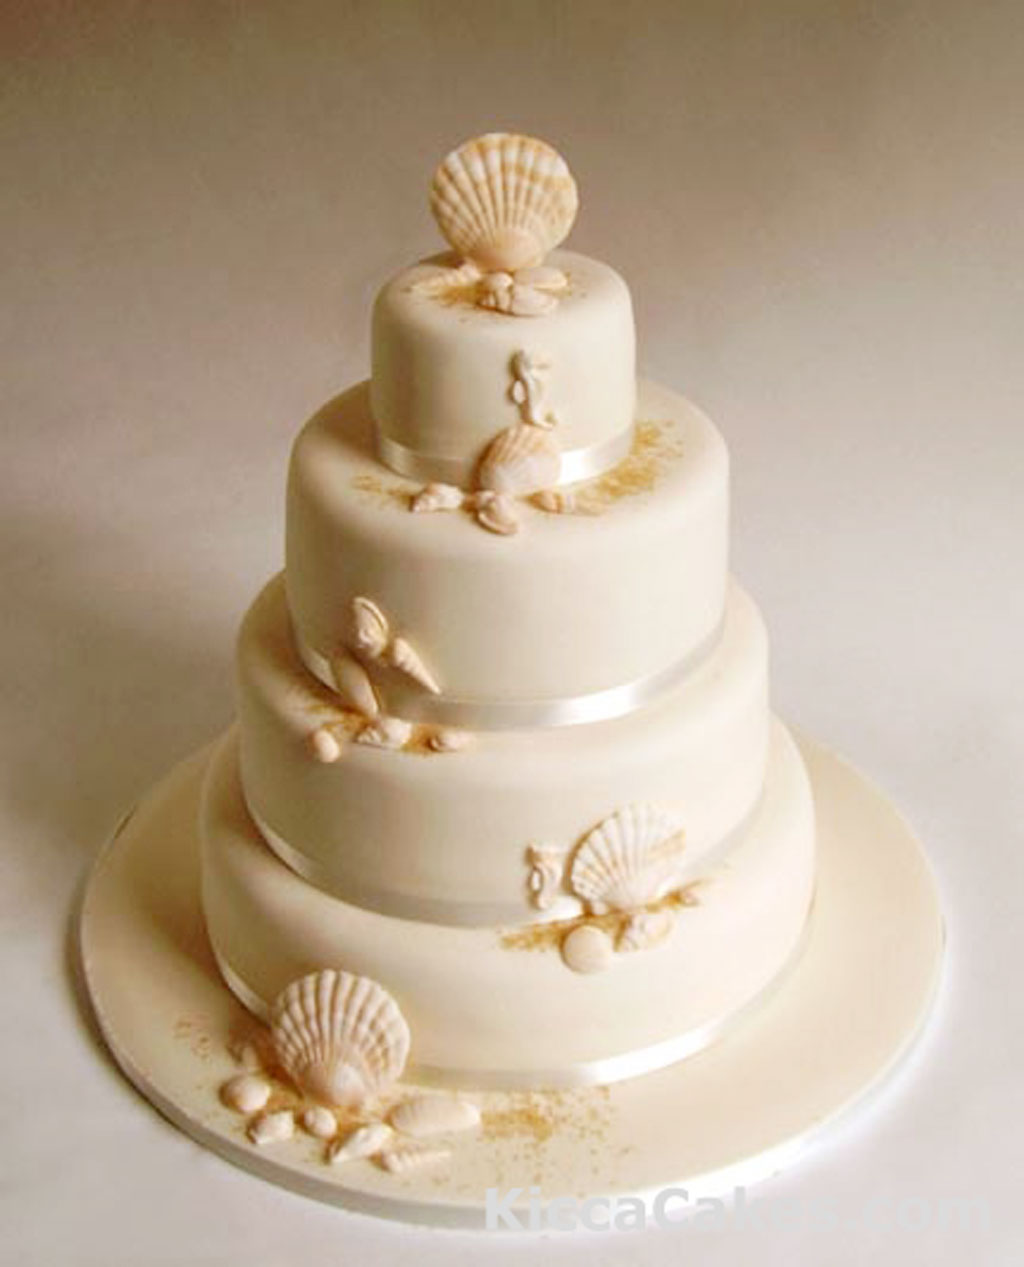 Chocolate Seashells For Wedding Cakes